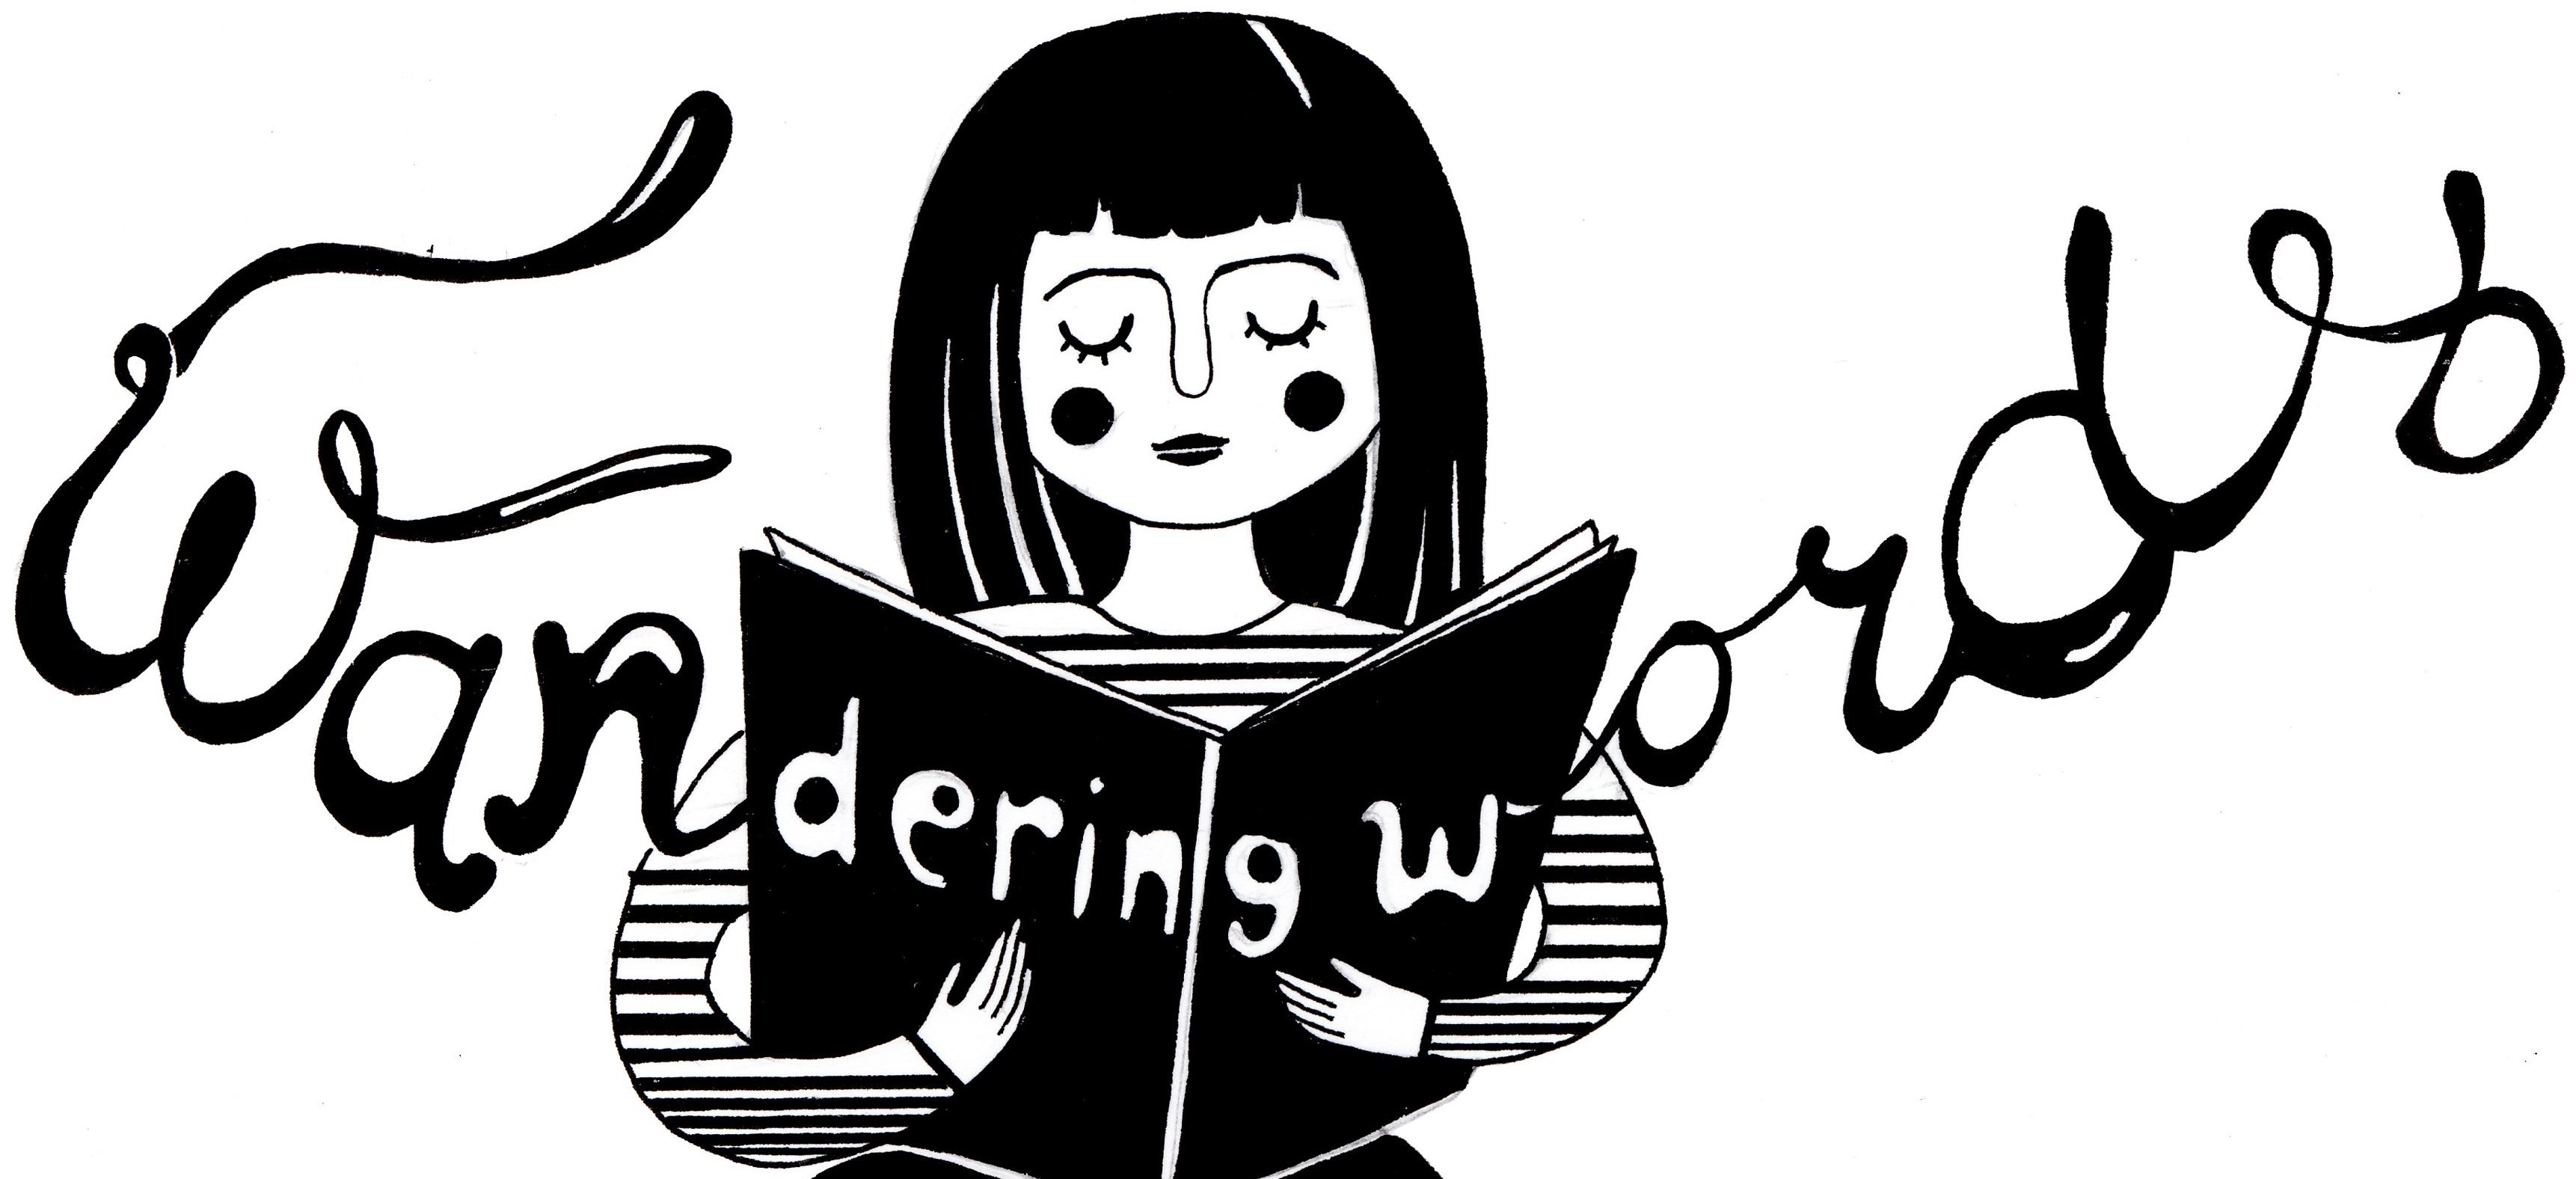 Wandering-Words-Header-2-1